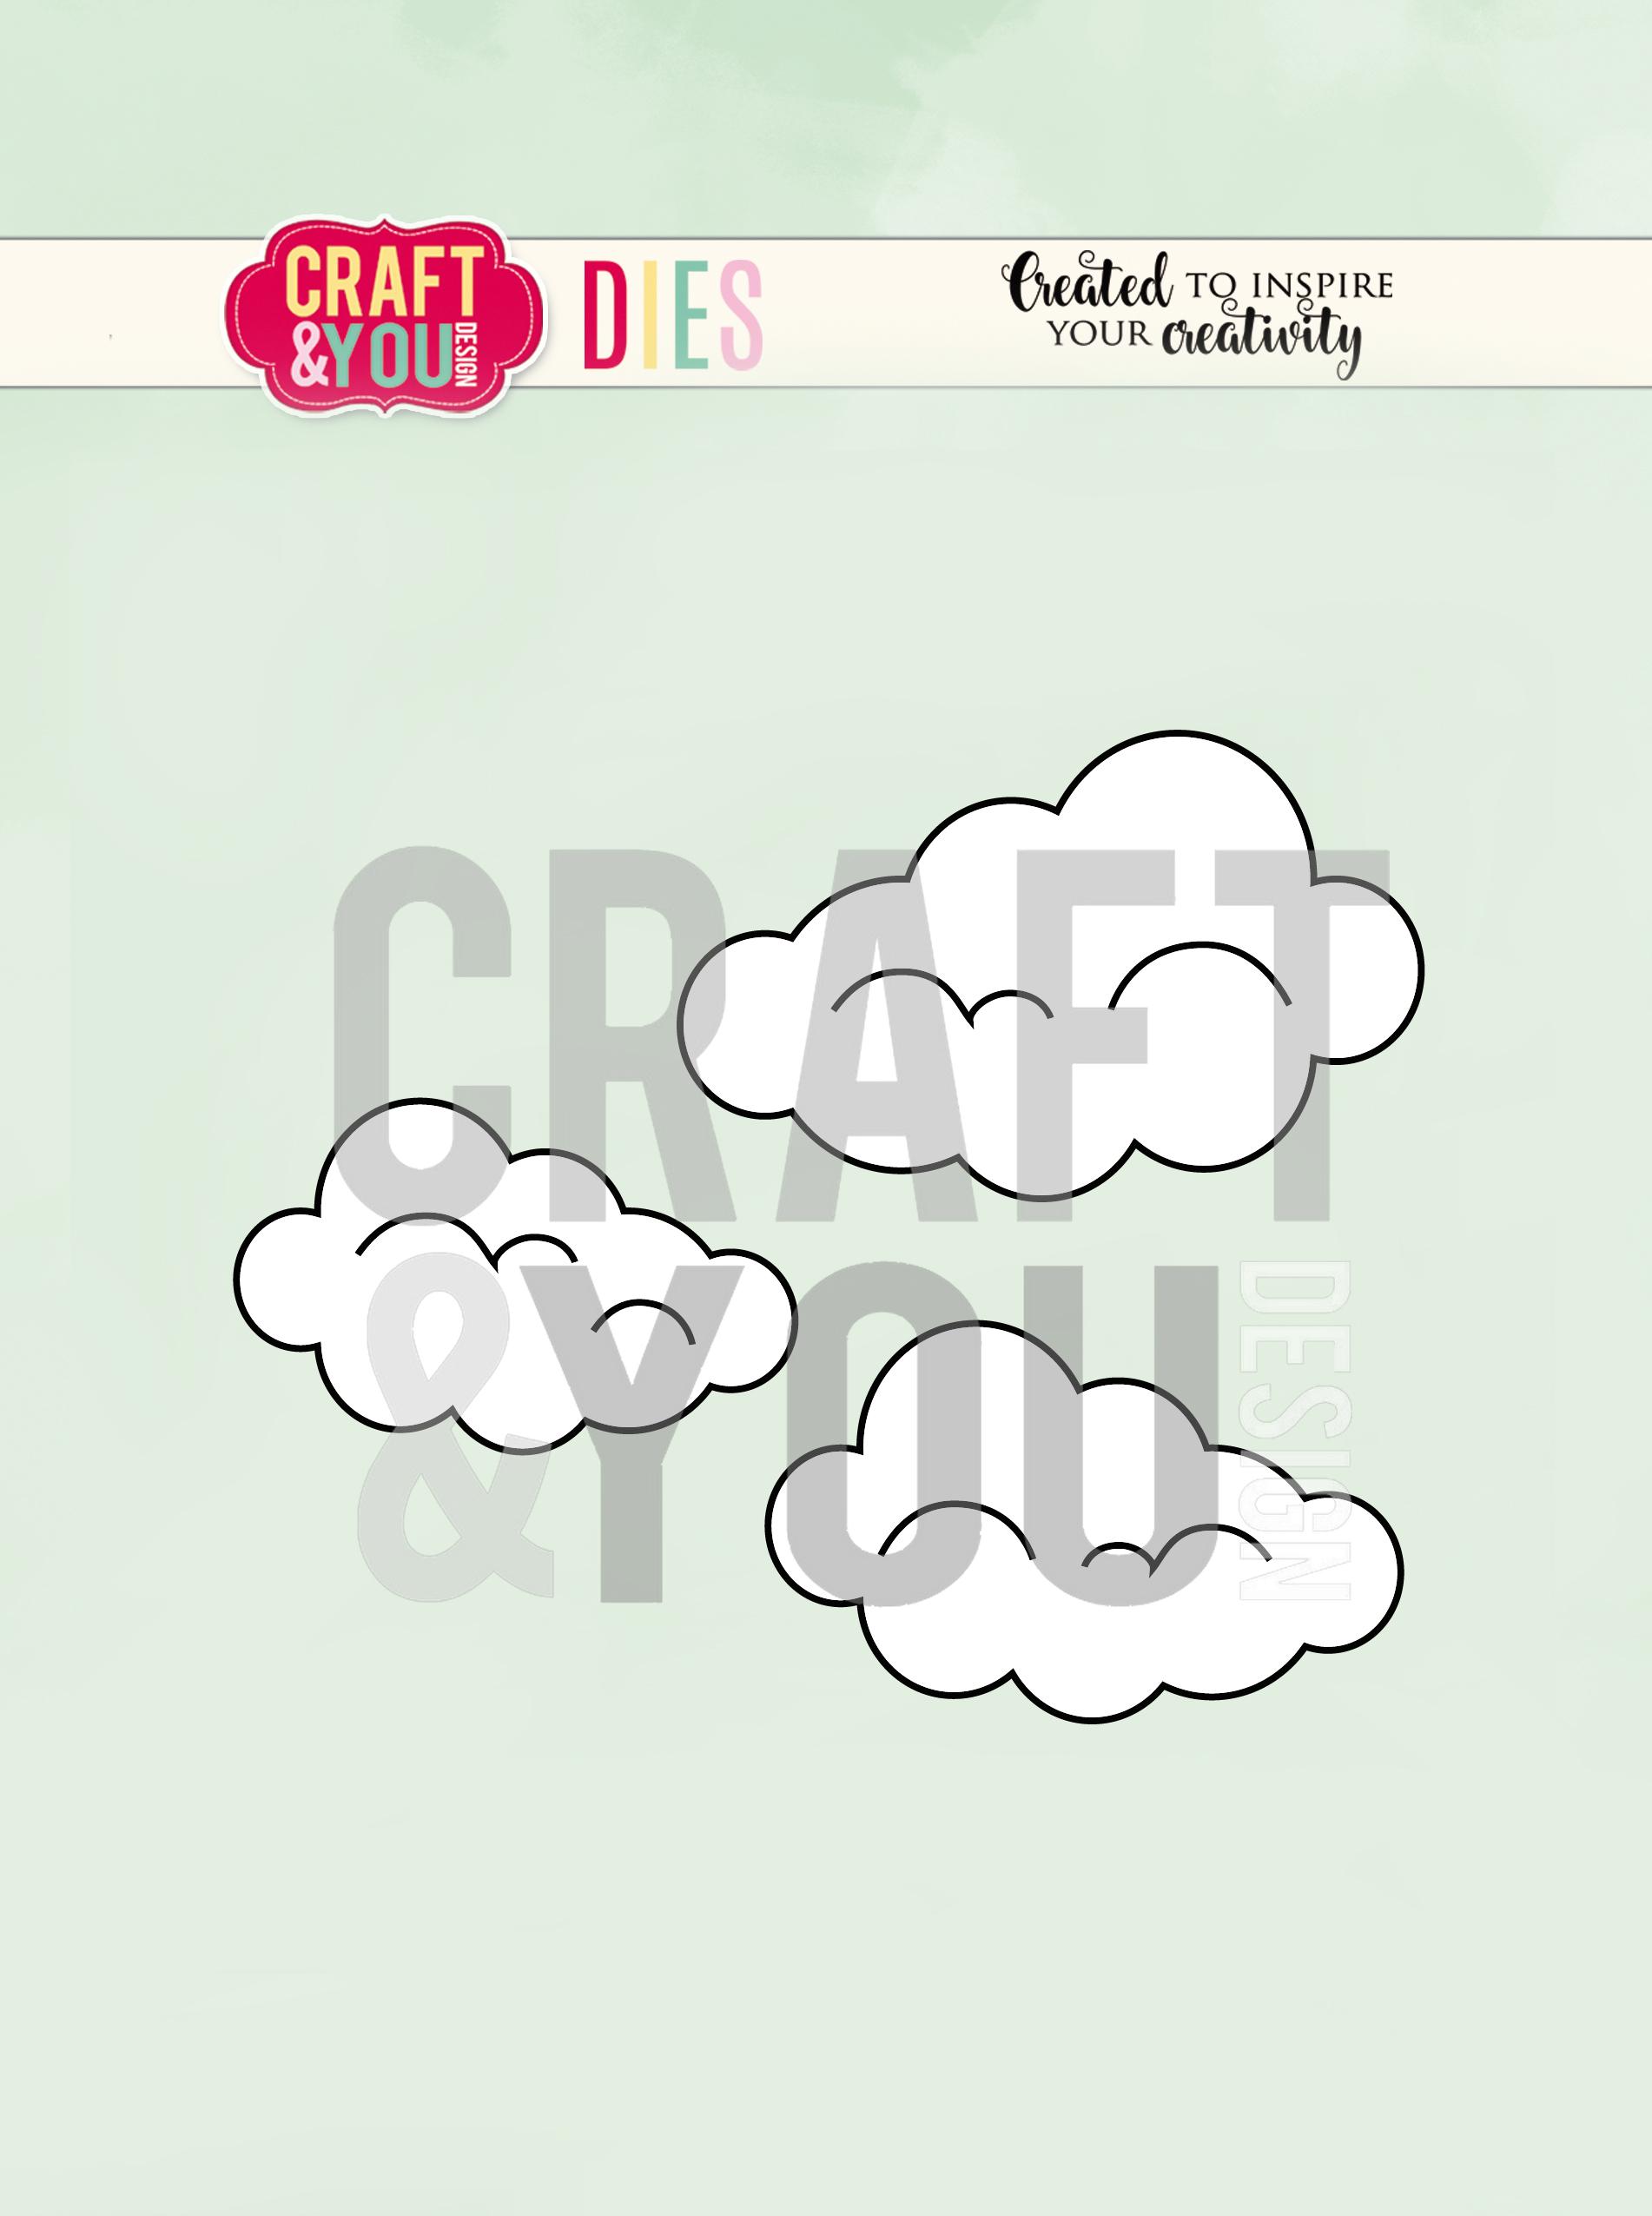 CW087 WYKROJNIK-Clouds-chmurki Craft&You Design